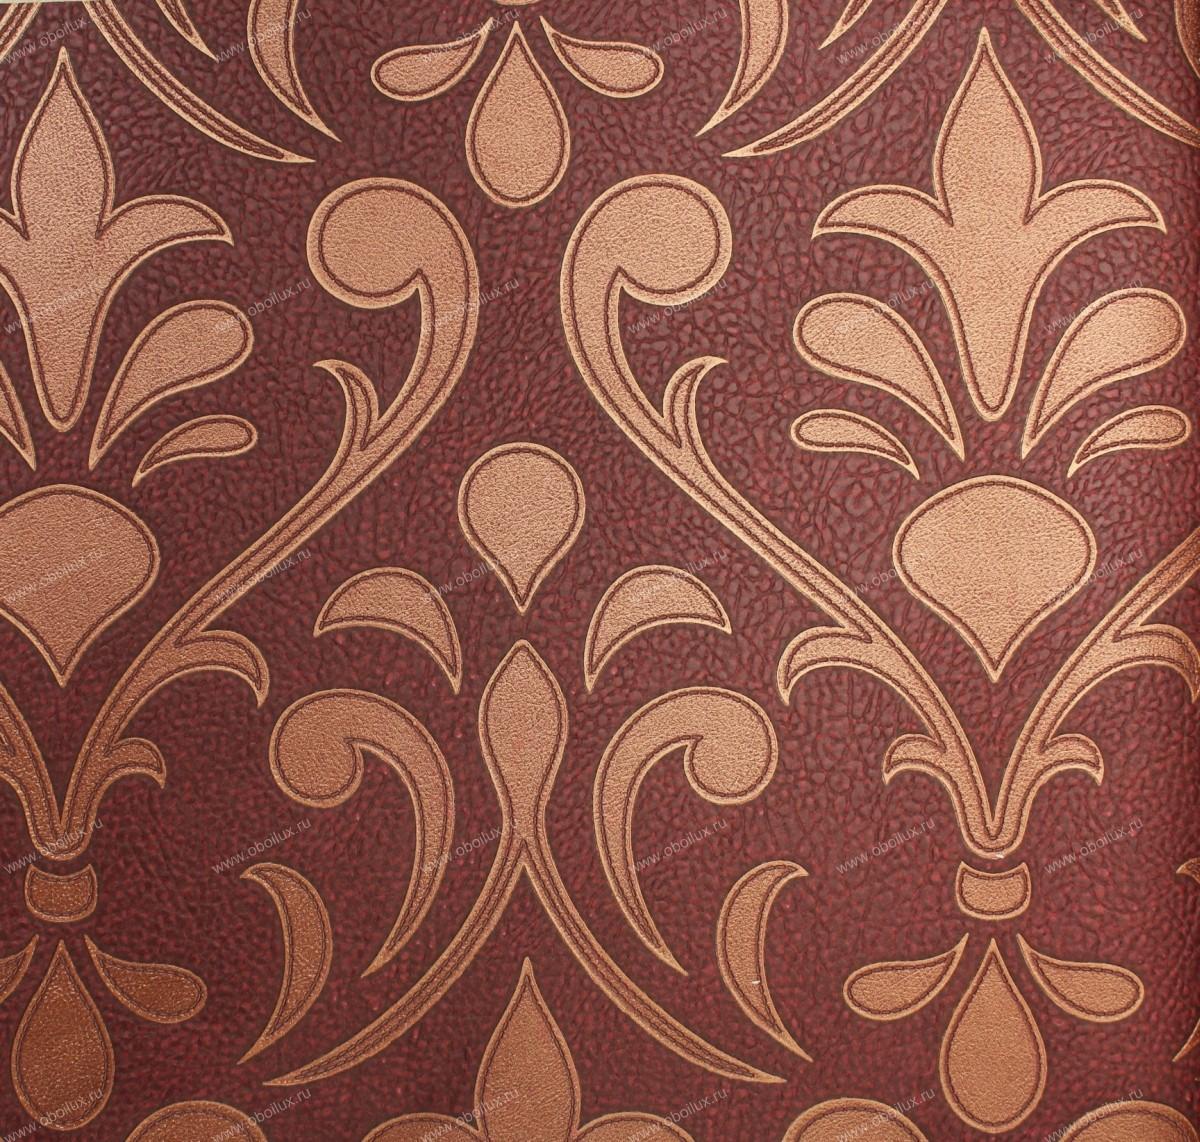 Итальянские обои Sirpi,  коллекция Decoskin, артикул14802